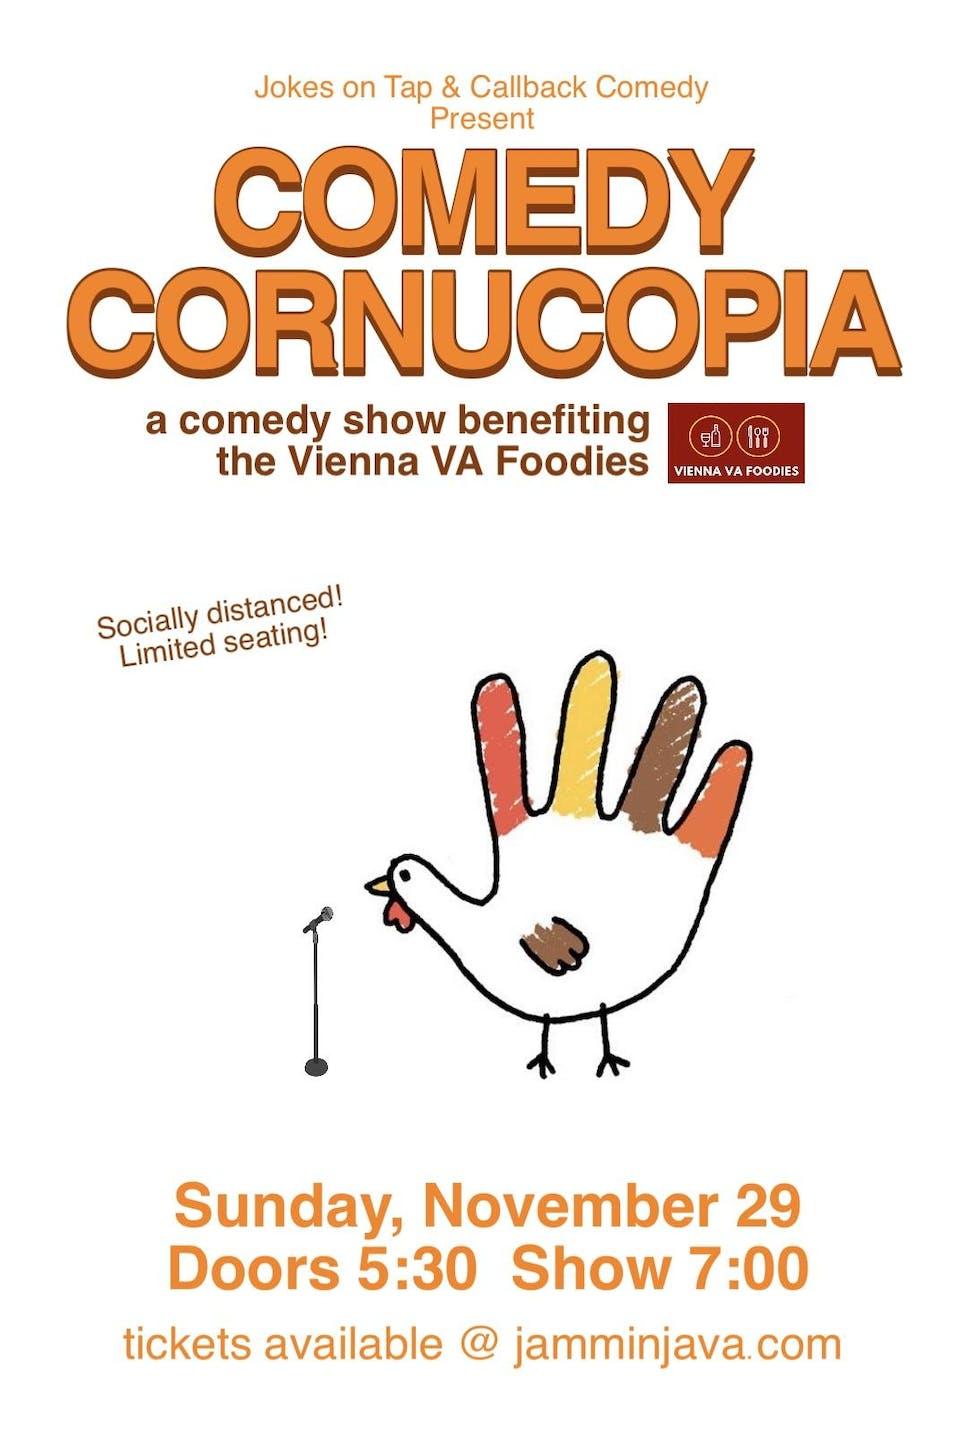 (Indoors + Distanced!) Comedy Cornucopia! Benefiting Vienna VA Foodies